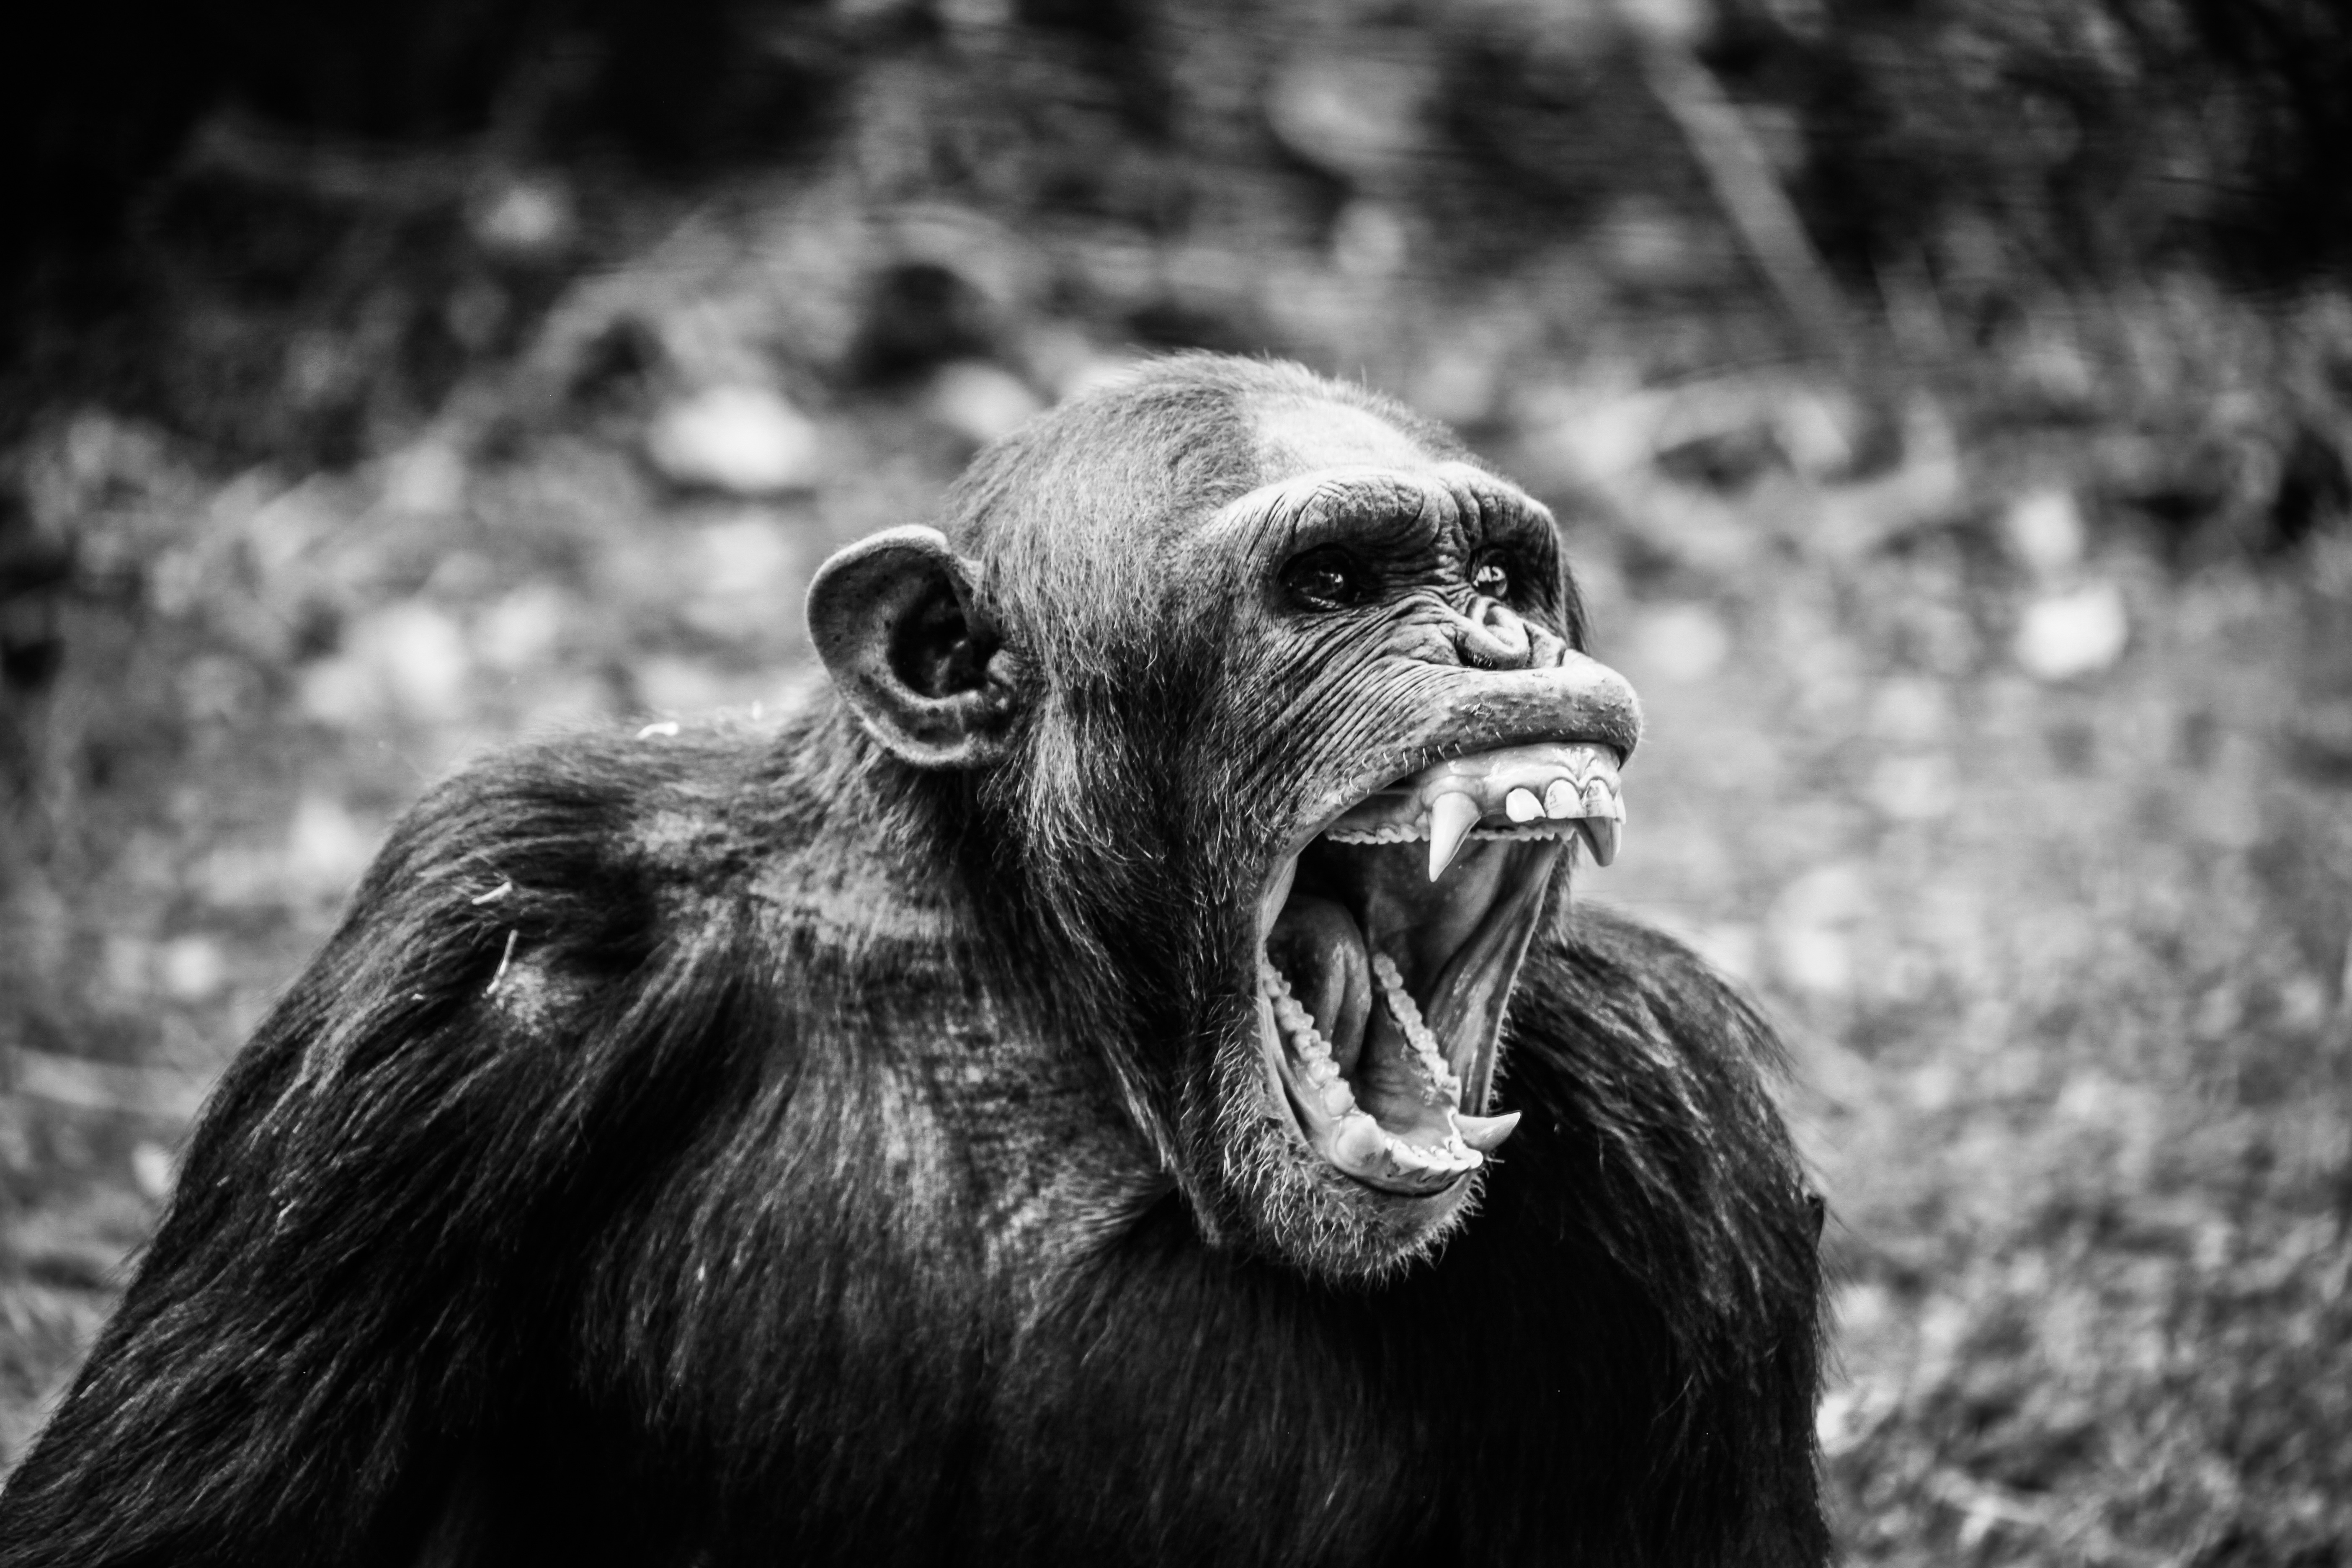 Ape, Animal, Gorilla, Power, Powerful, HQ Photo